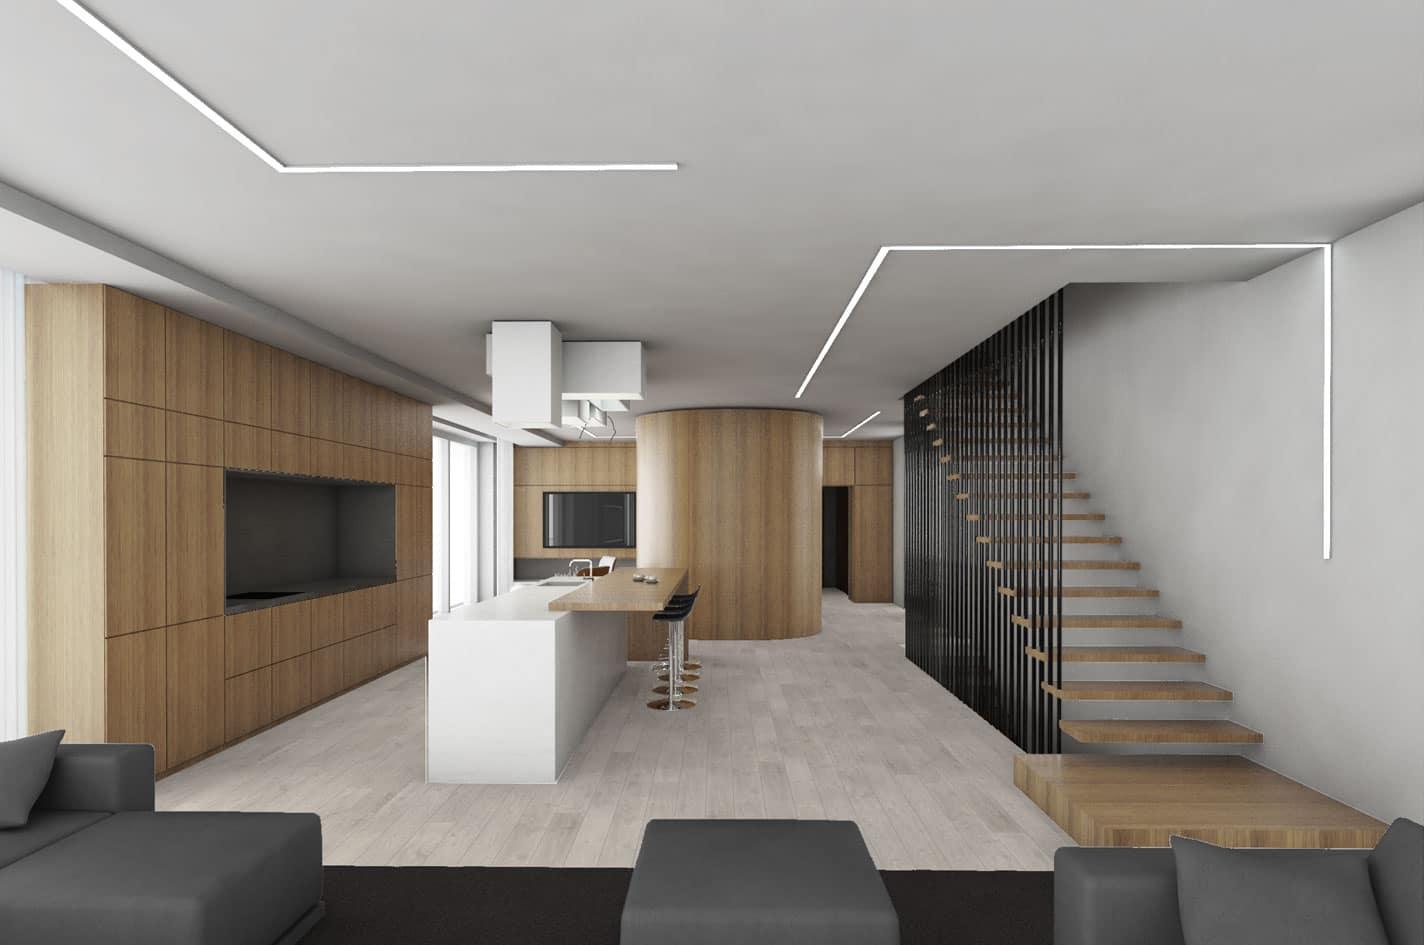 Villa G interior design view to the kitchen zone